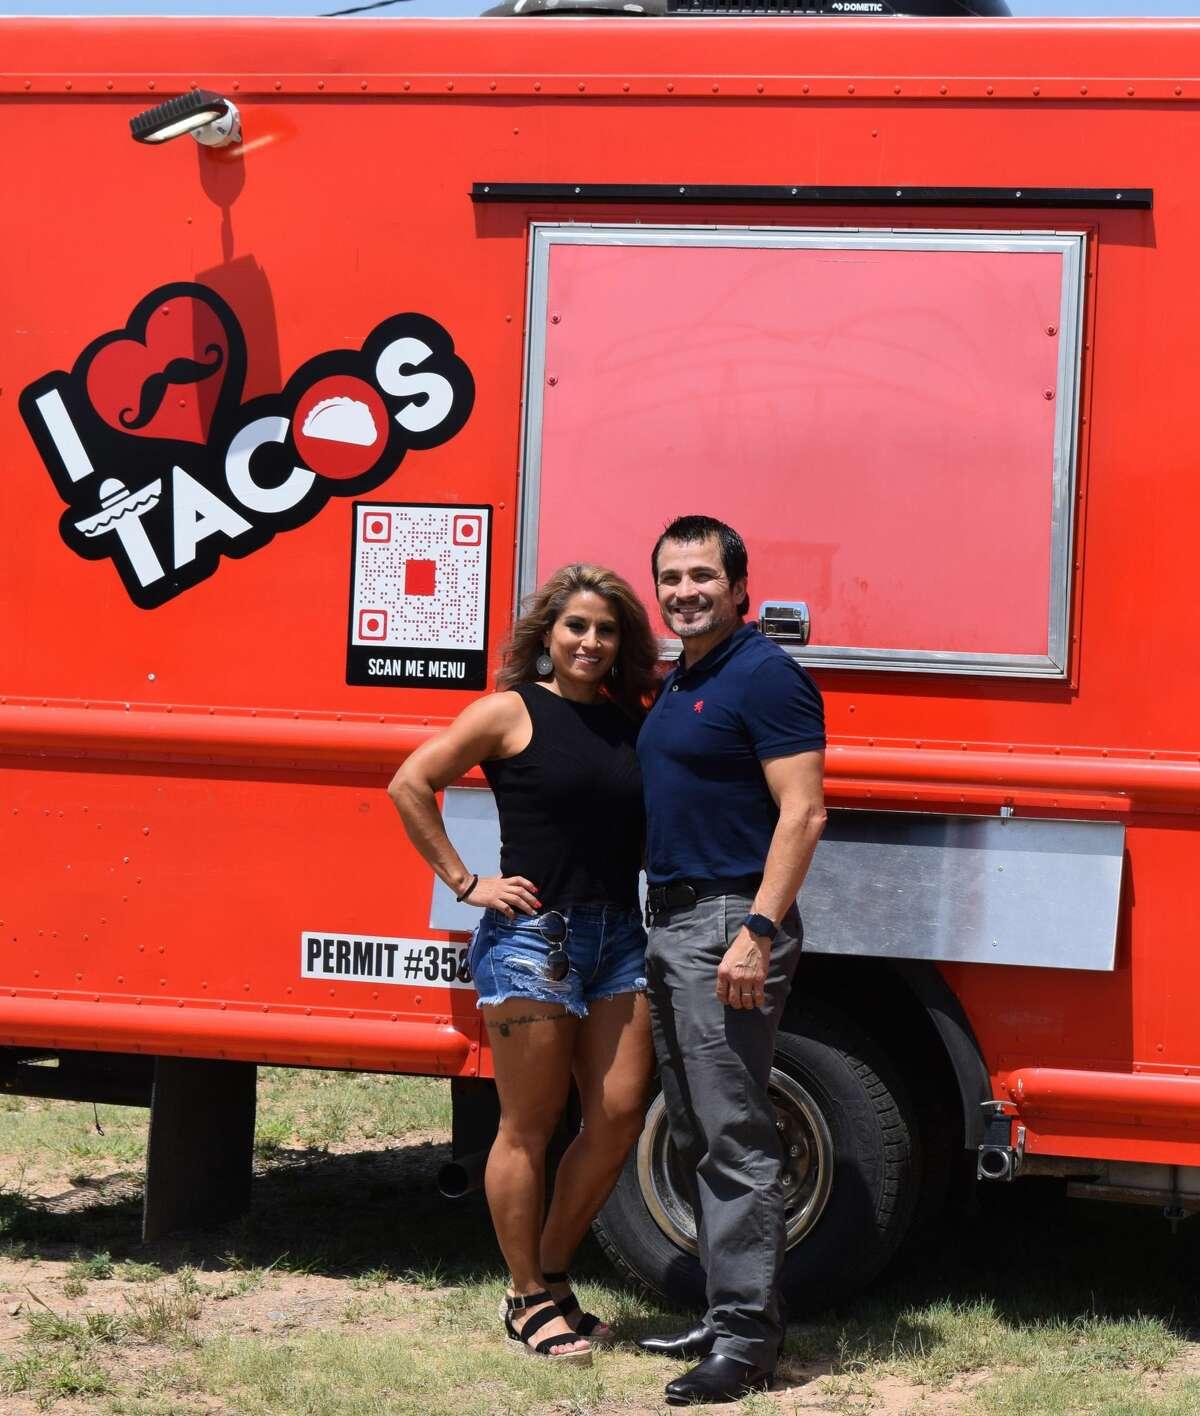 Sonya Balderas, owner of El Mercadito Street Tacos, recently opened a food truck.